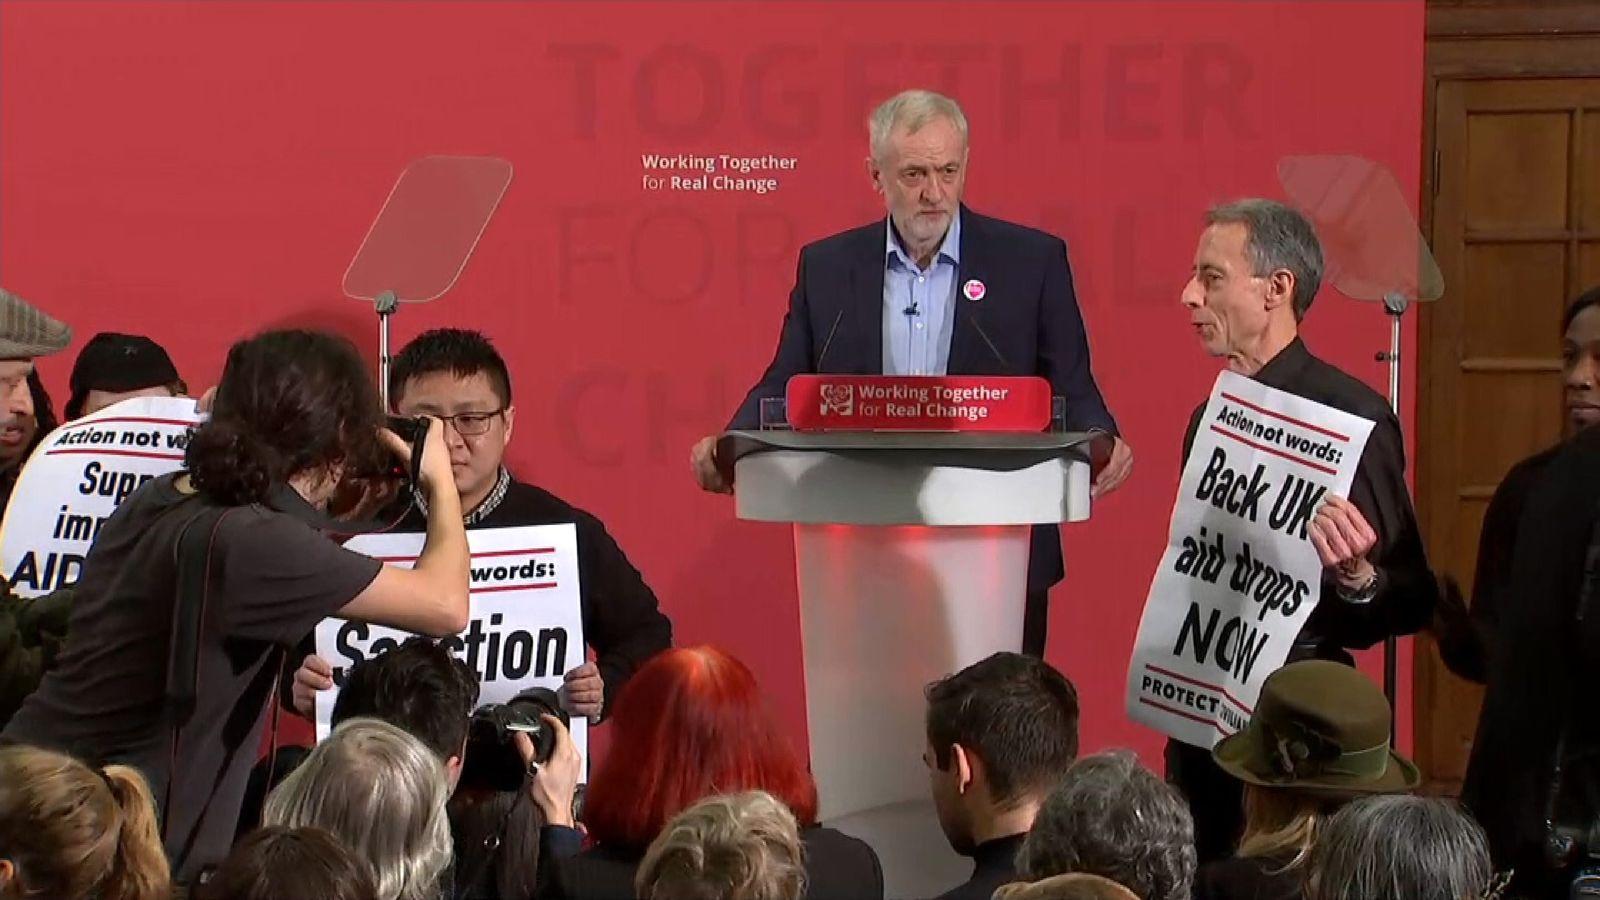 Peter Tatchell disrupted a Jeremy Corbyn speech